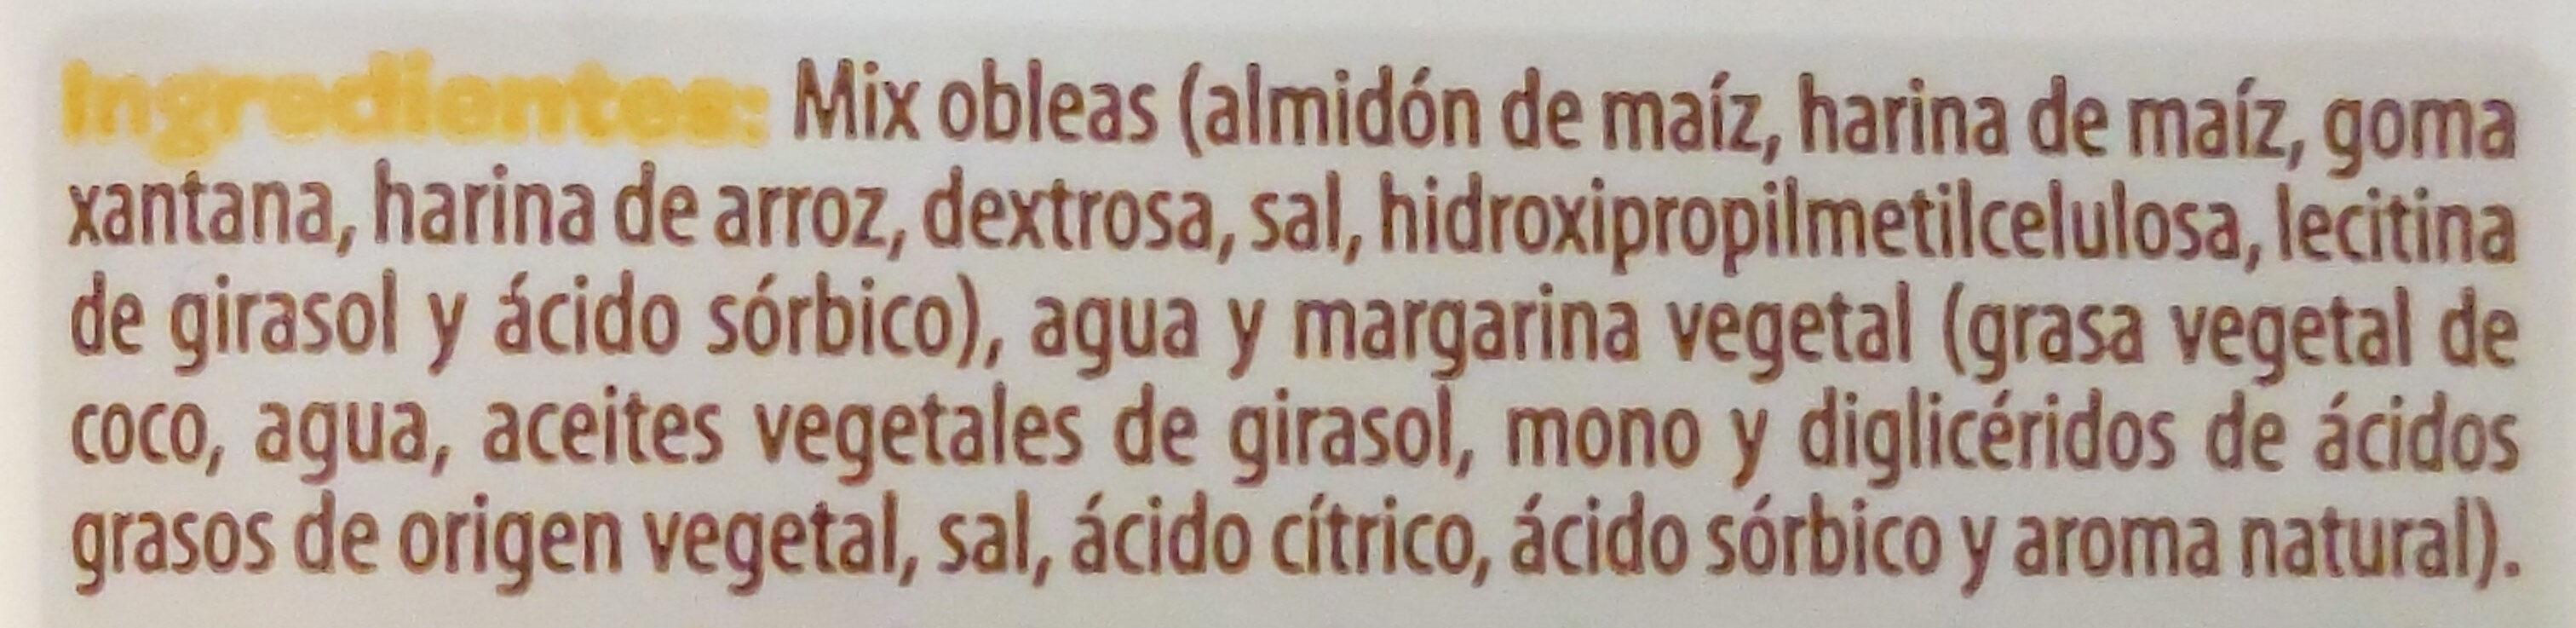 Masa de obleas - Ingrediënten - es